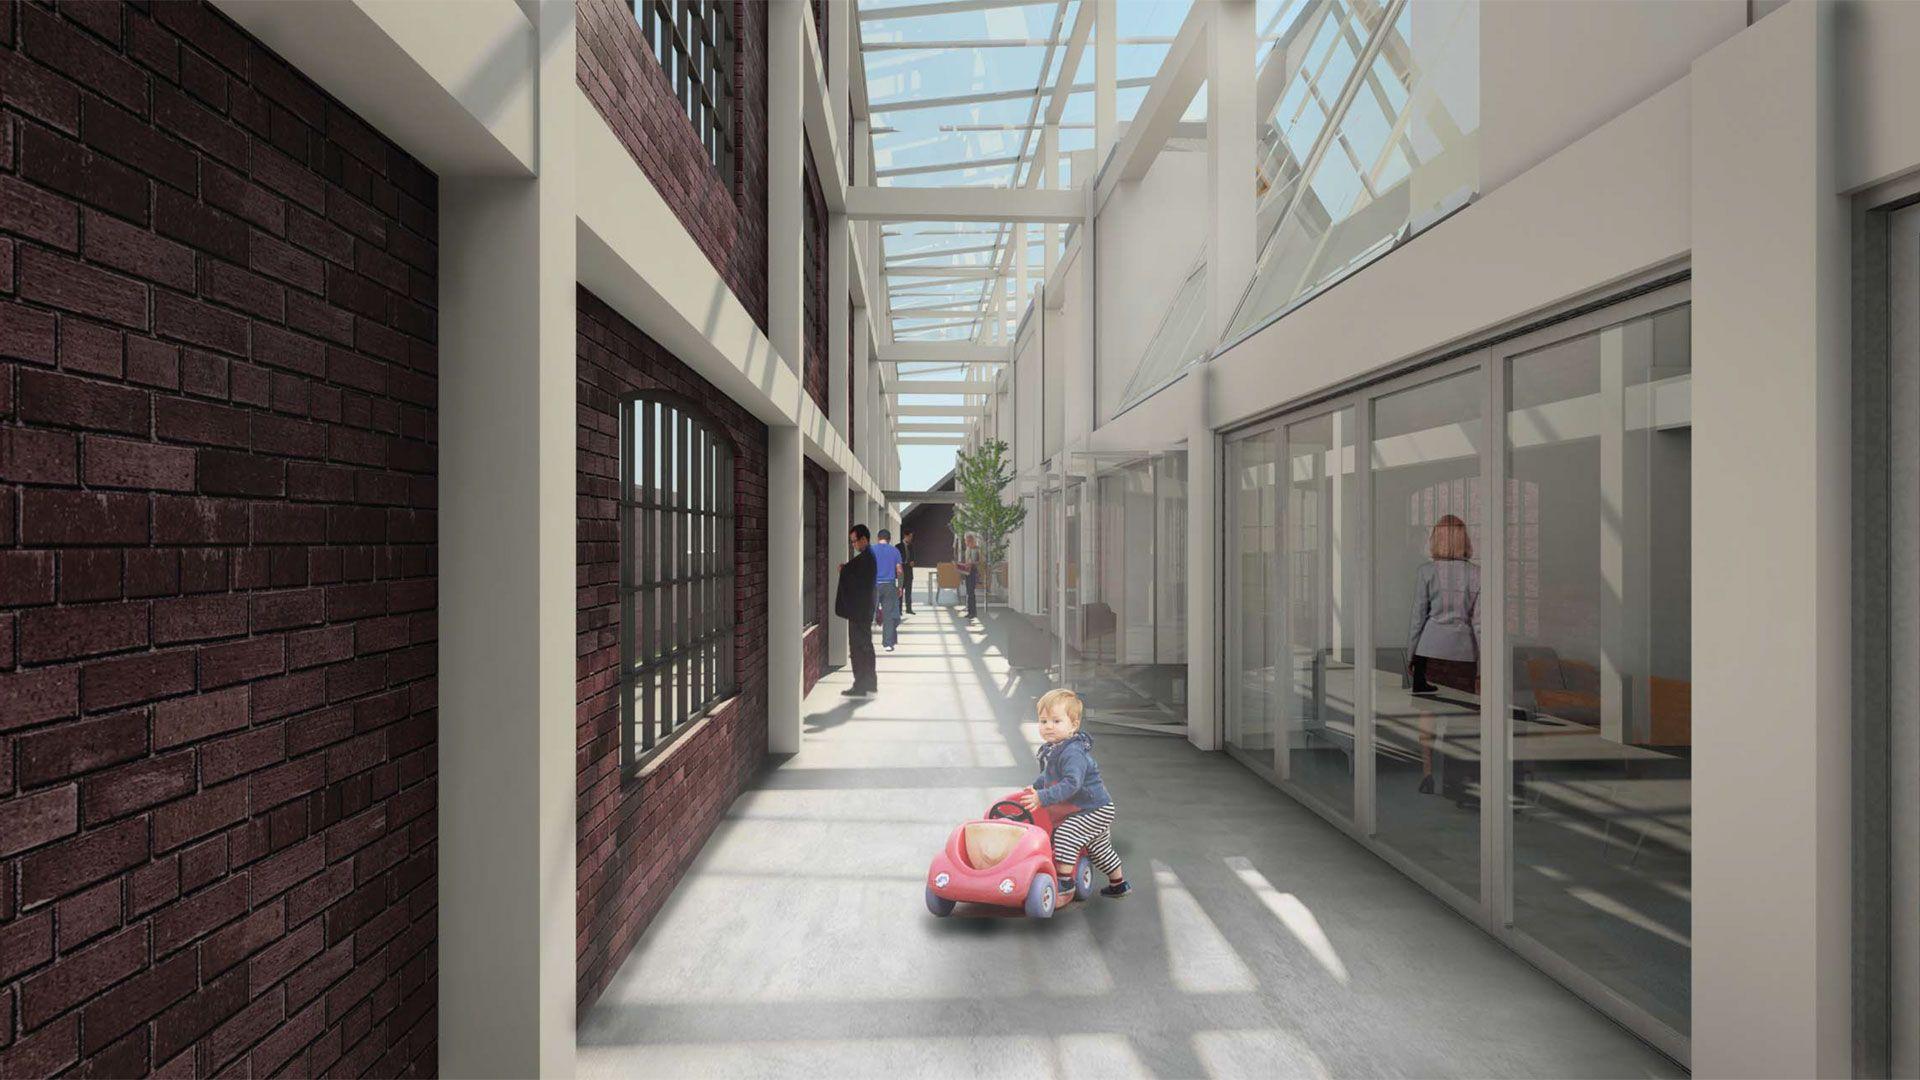 Reuse proposal factory - photoshop / interior